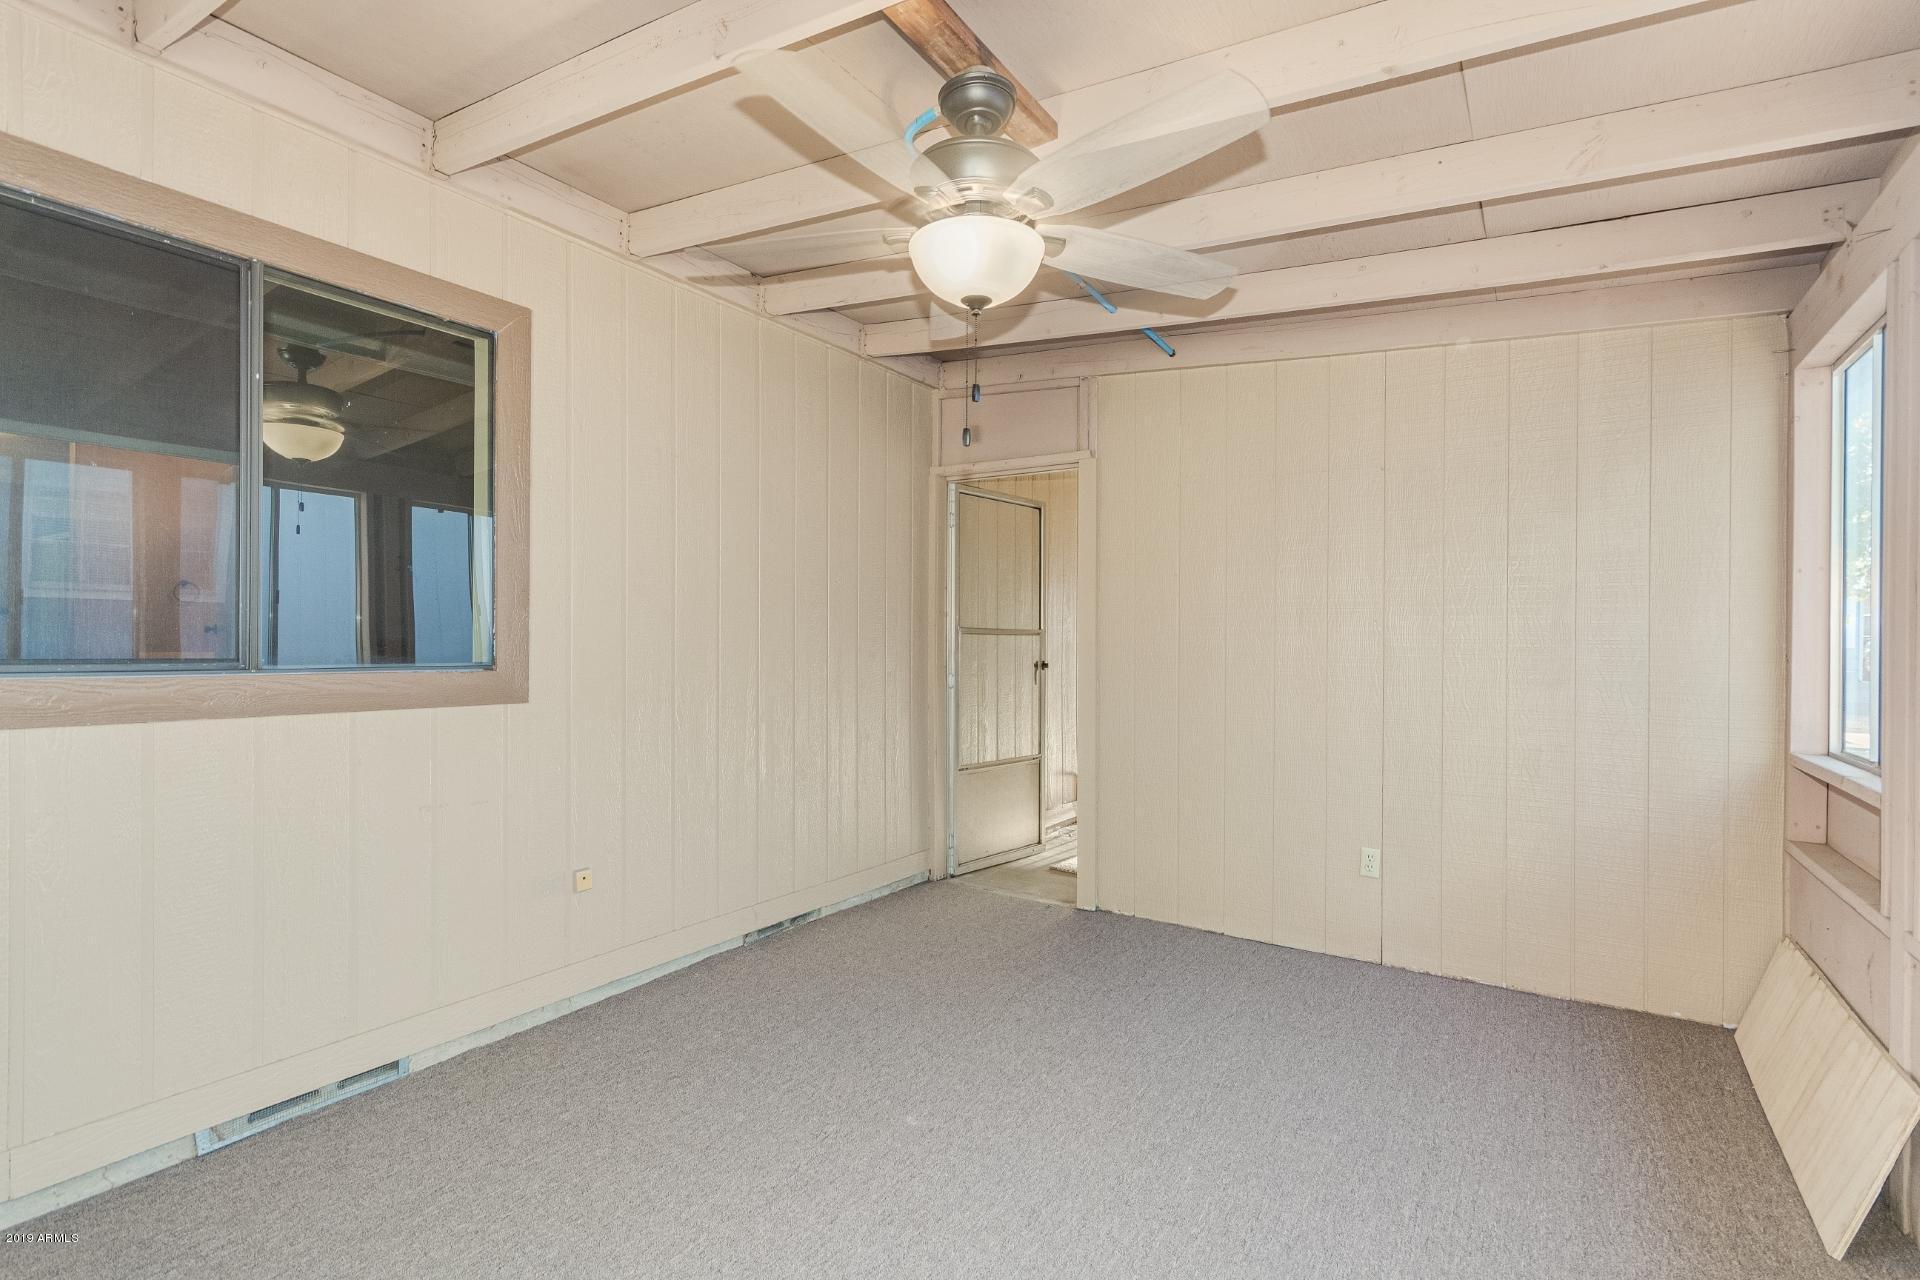 MLS 5968258 11275 N 99th Avenue Unit 211, Peoria, AZ 85345 Peoria AZ Affordable